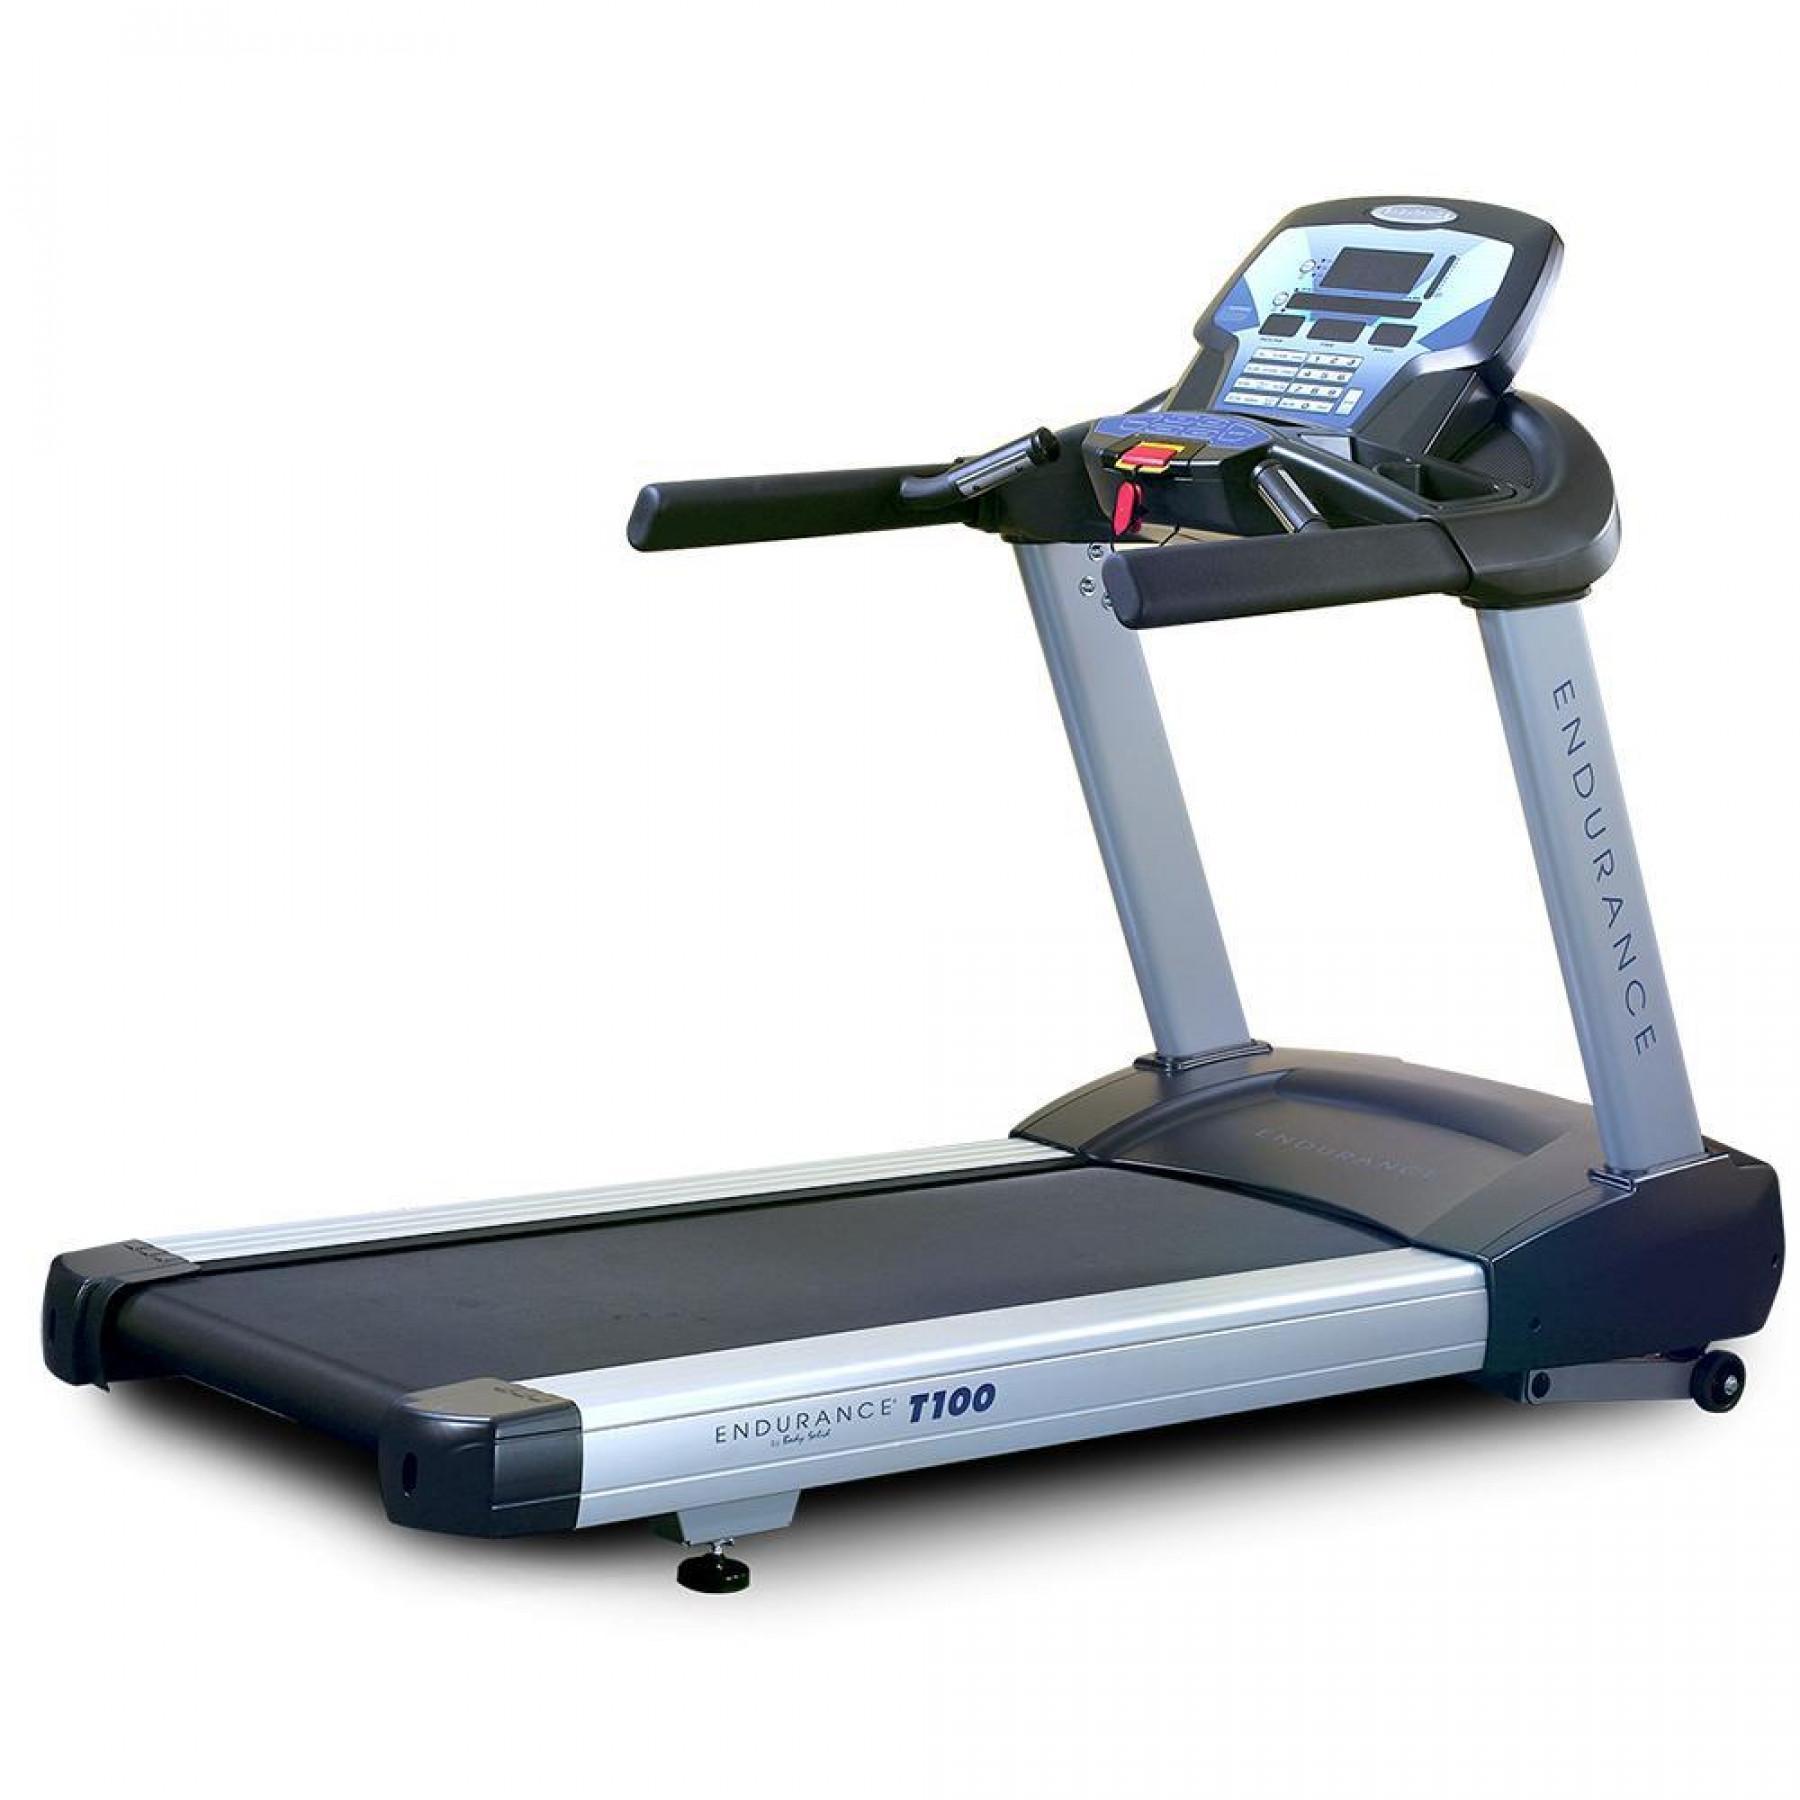 Treadmill Endurance T100 Treadmill Endurance